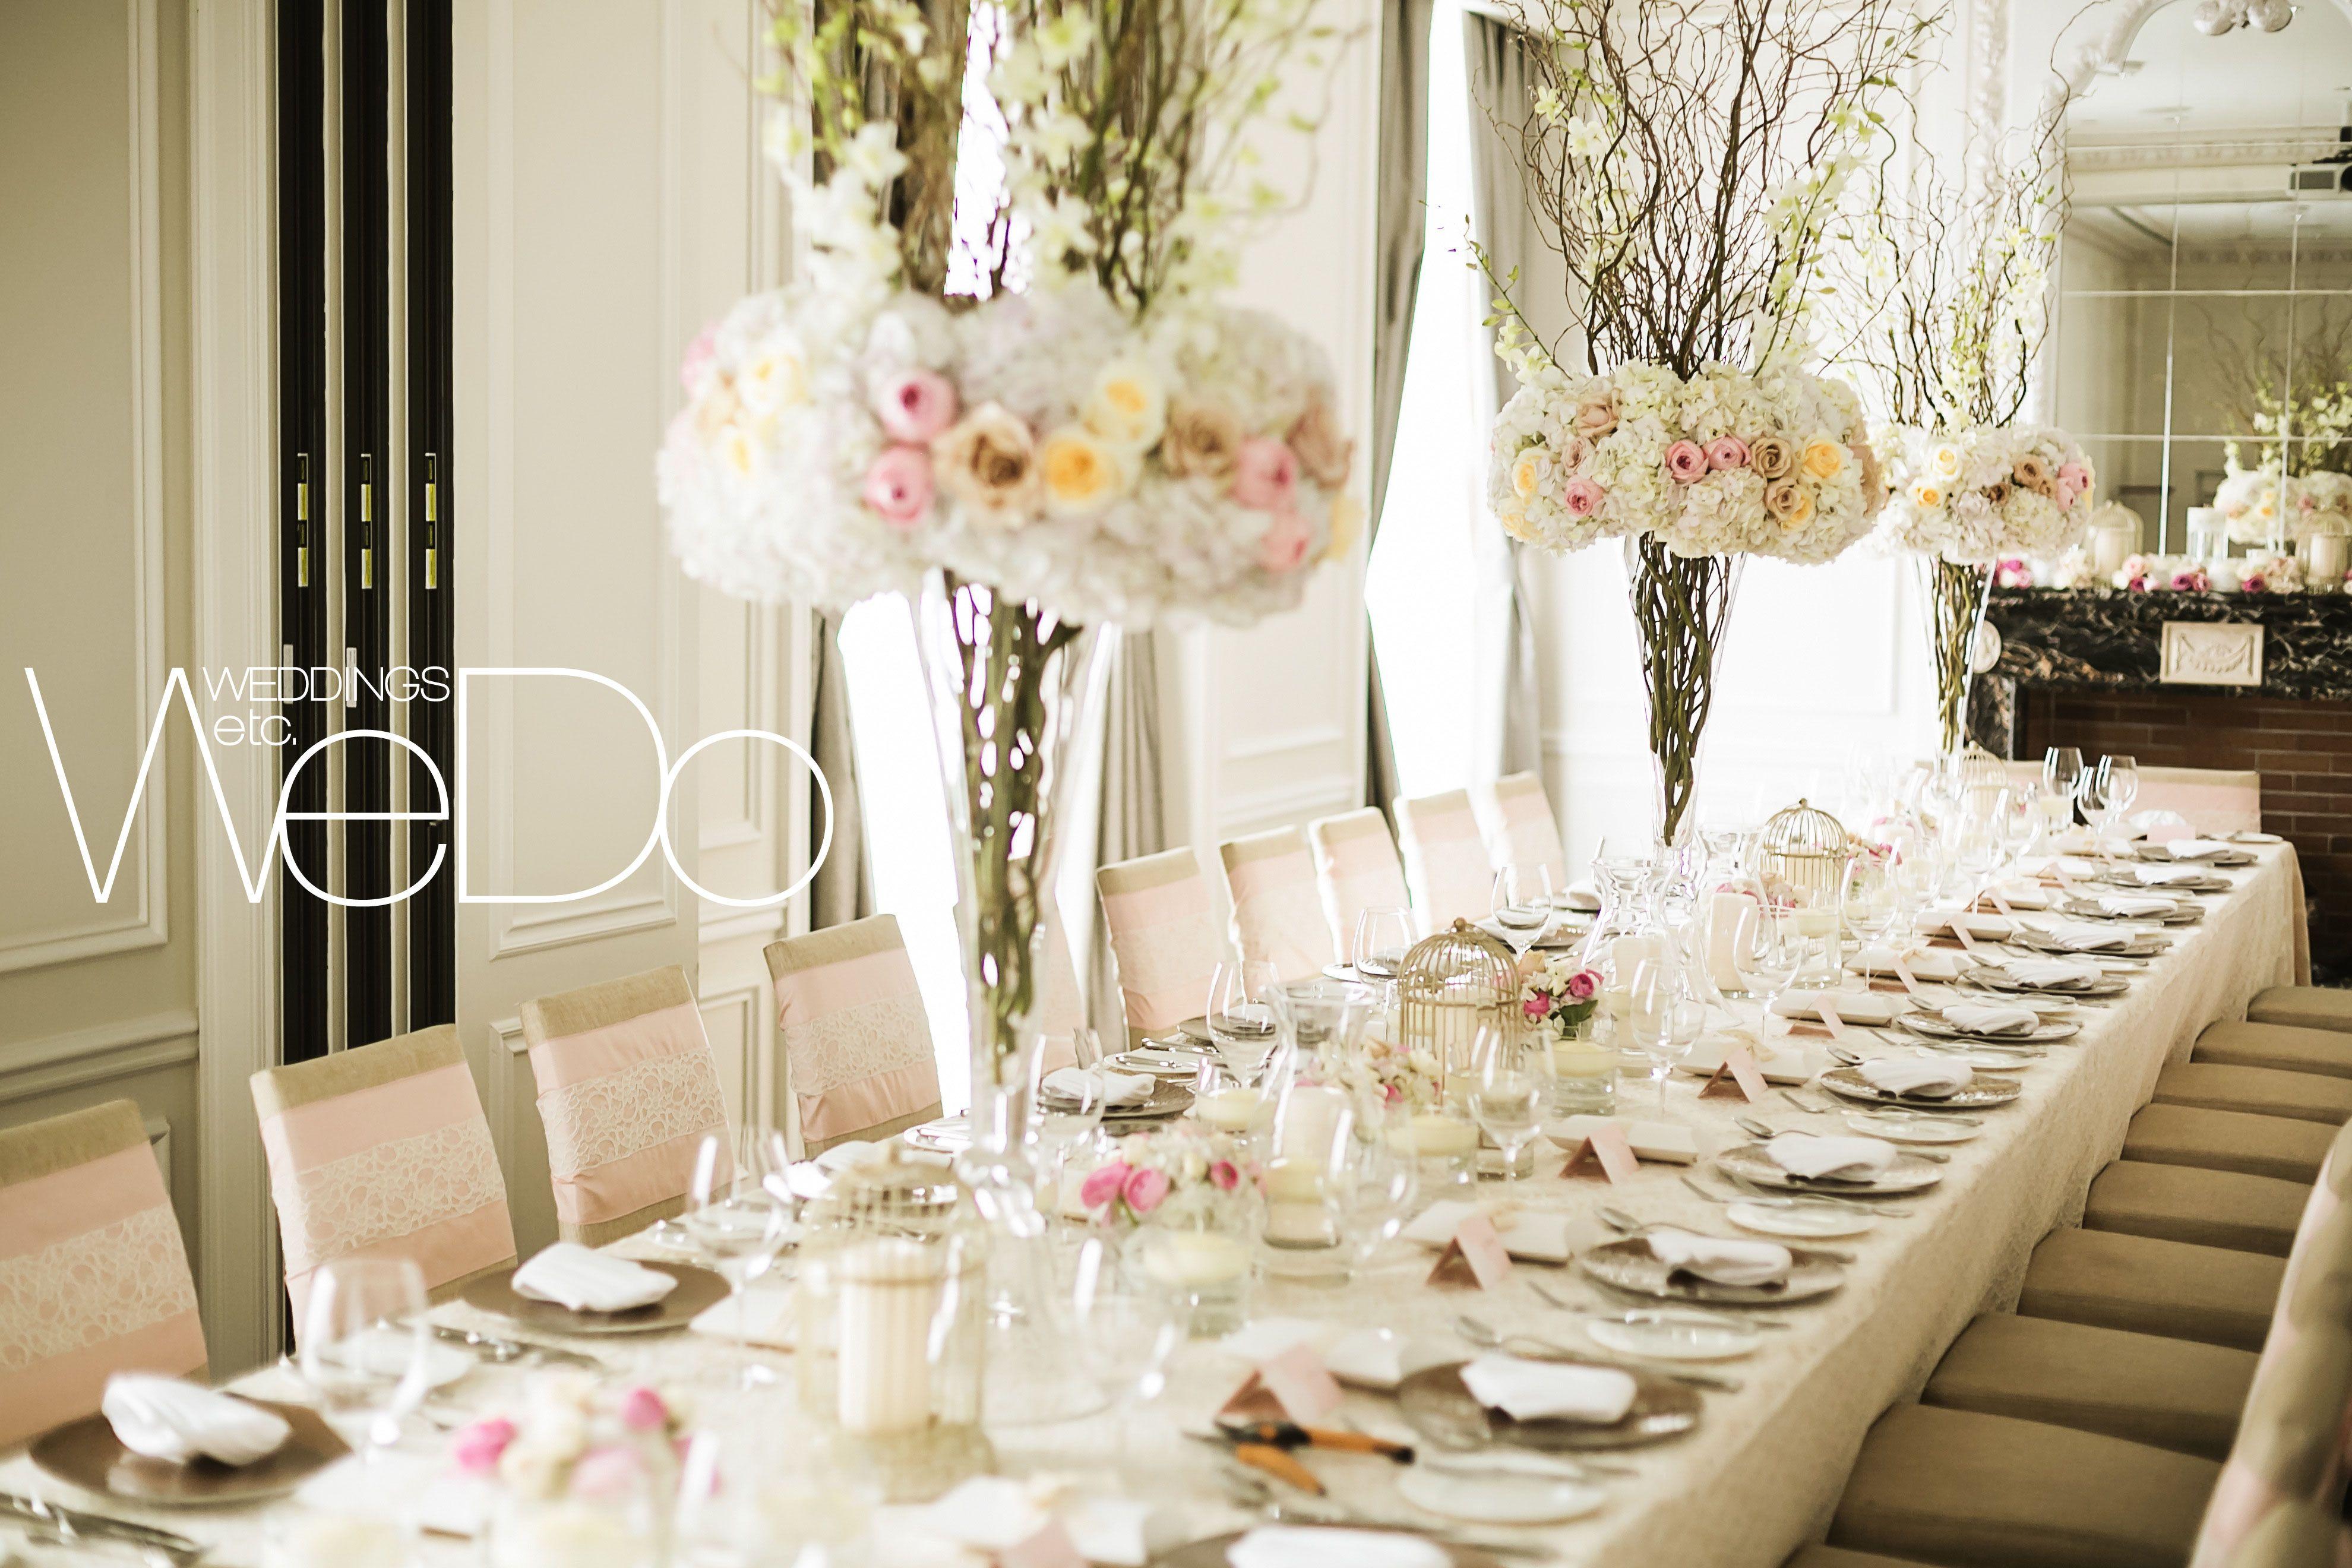 Modern Classic Wedding Themes Photo - Wedding Idea 2018 ...